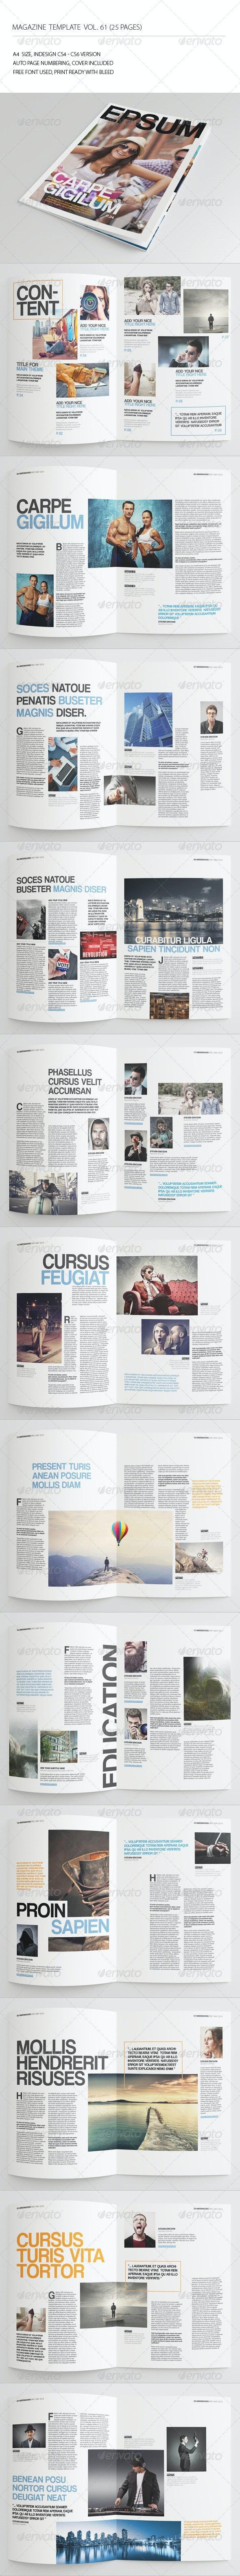 25 Pages Simple Magazine Vol61 - Magazines Print Templates